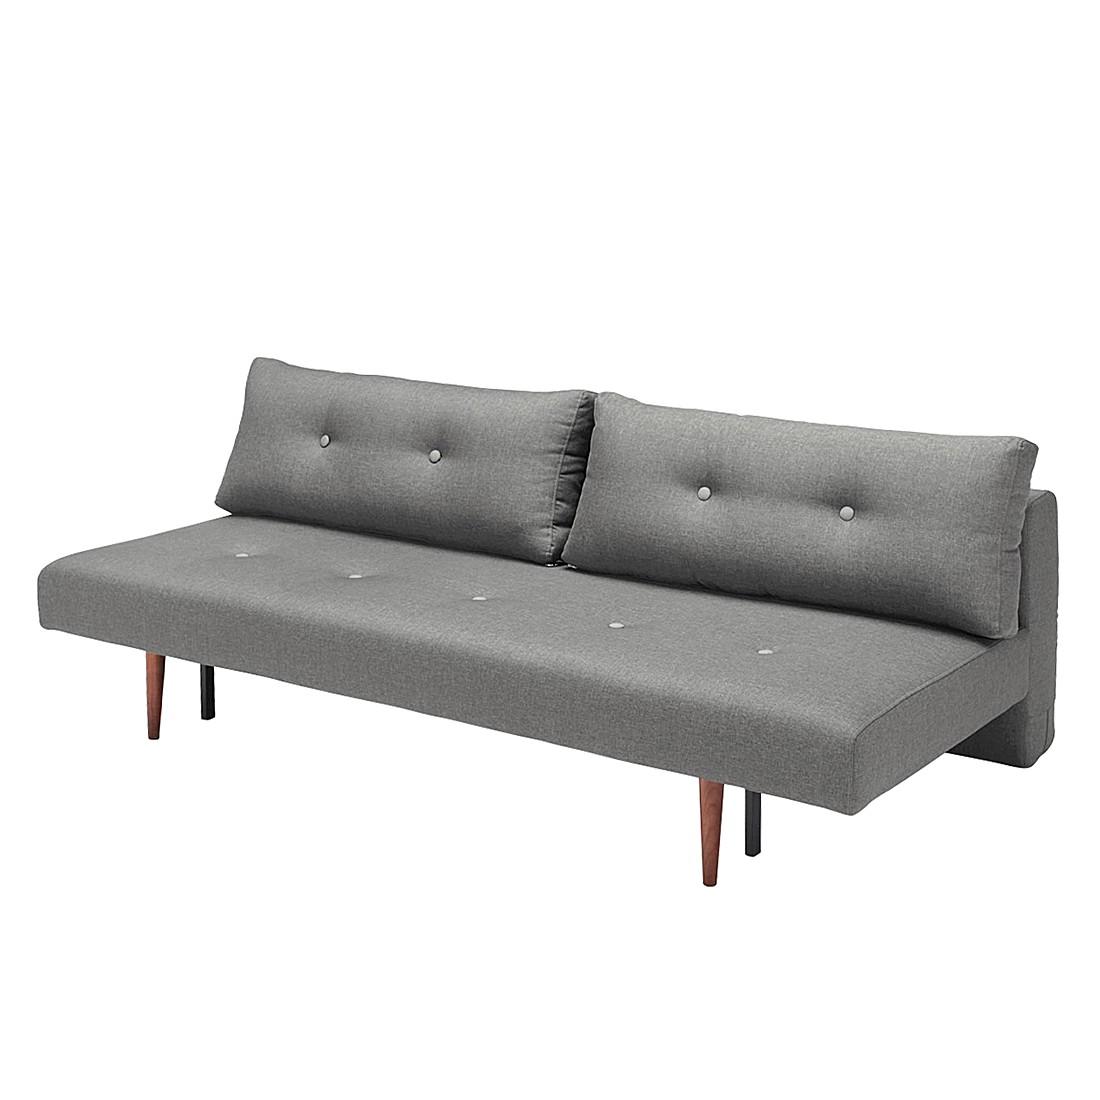 schlafsofa lazy time stoff dunkelgrau innovation g nstig kaufen. Black Bedroom Furniture Sets. Home Design Ideas